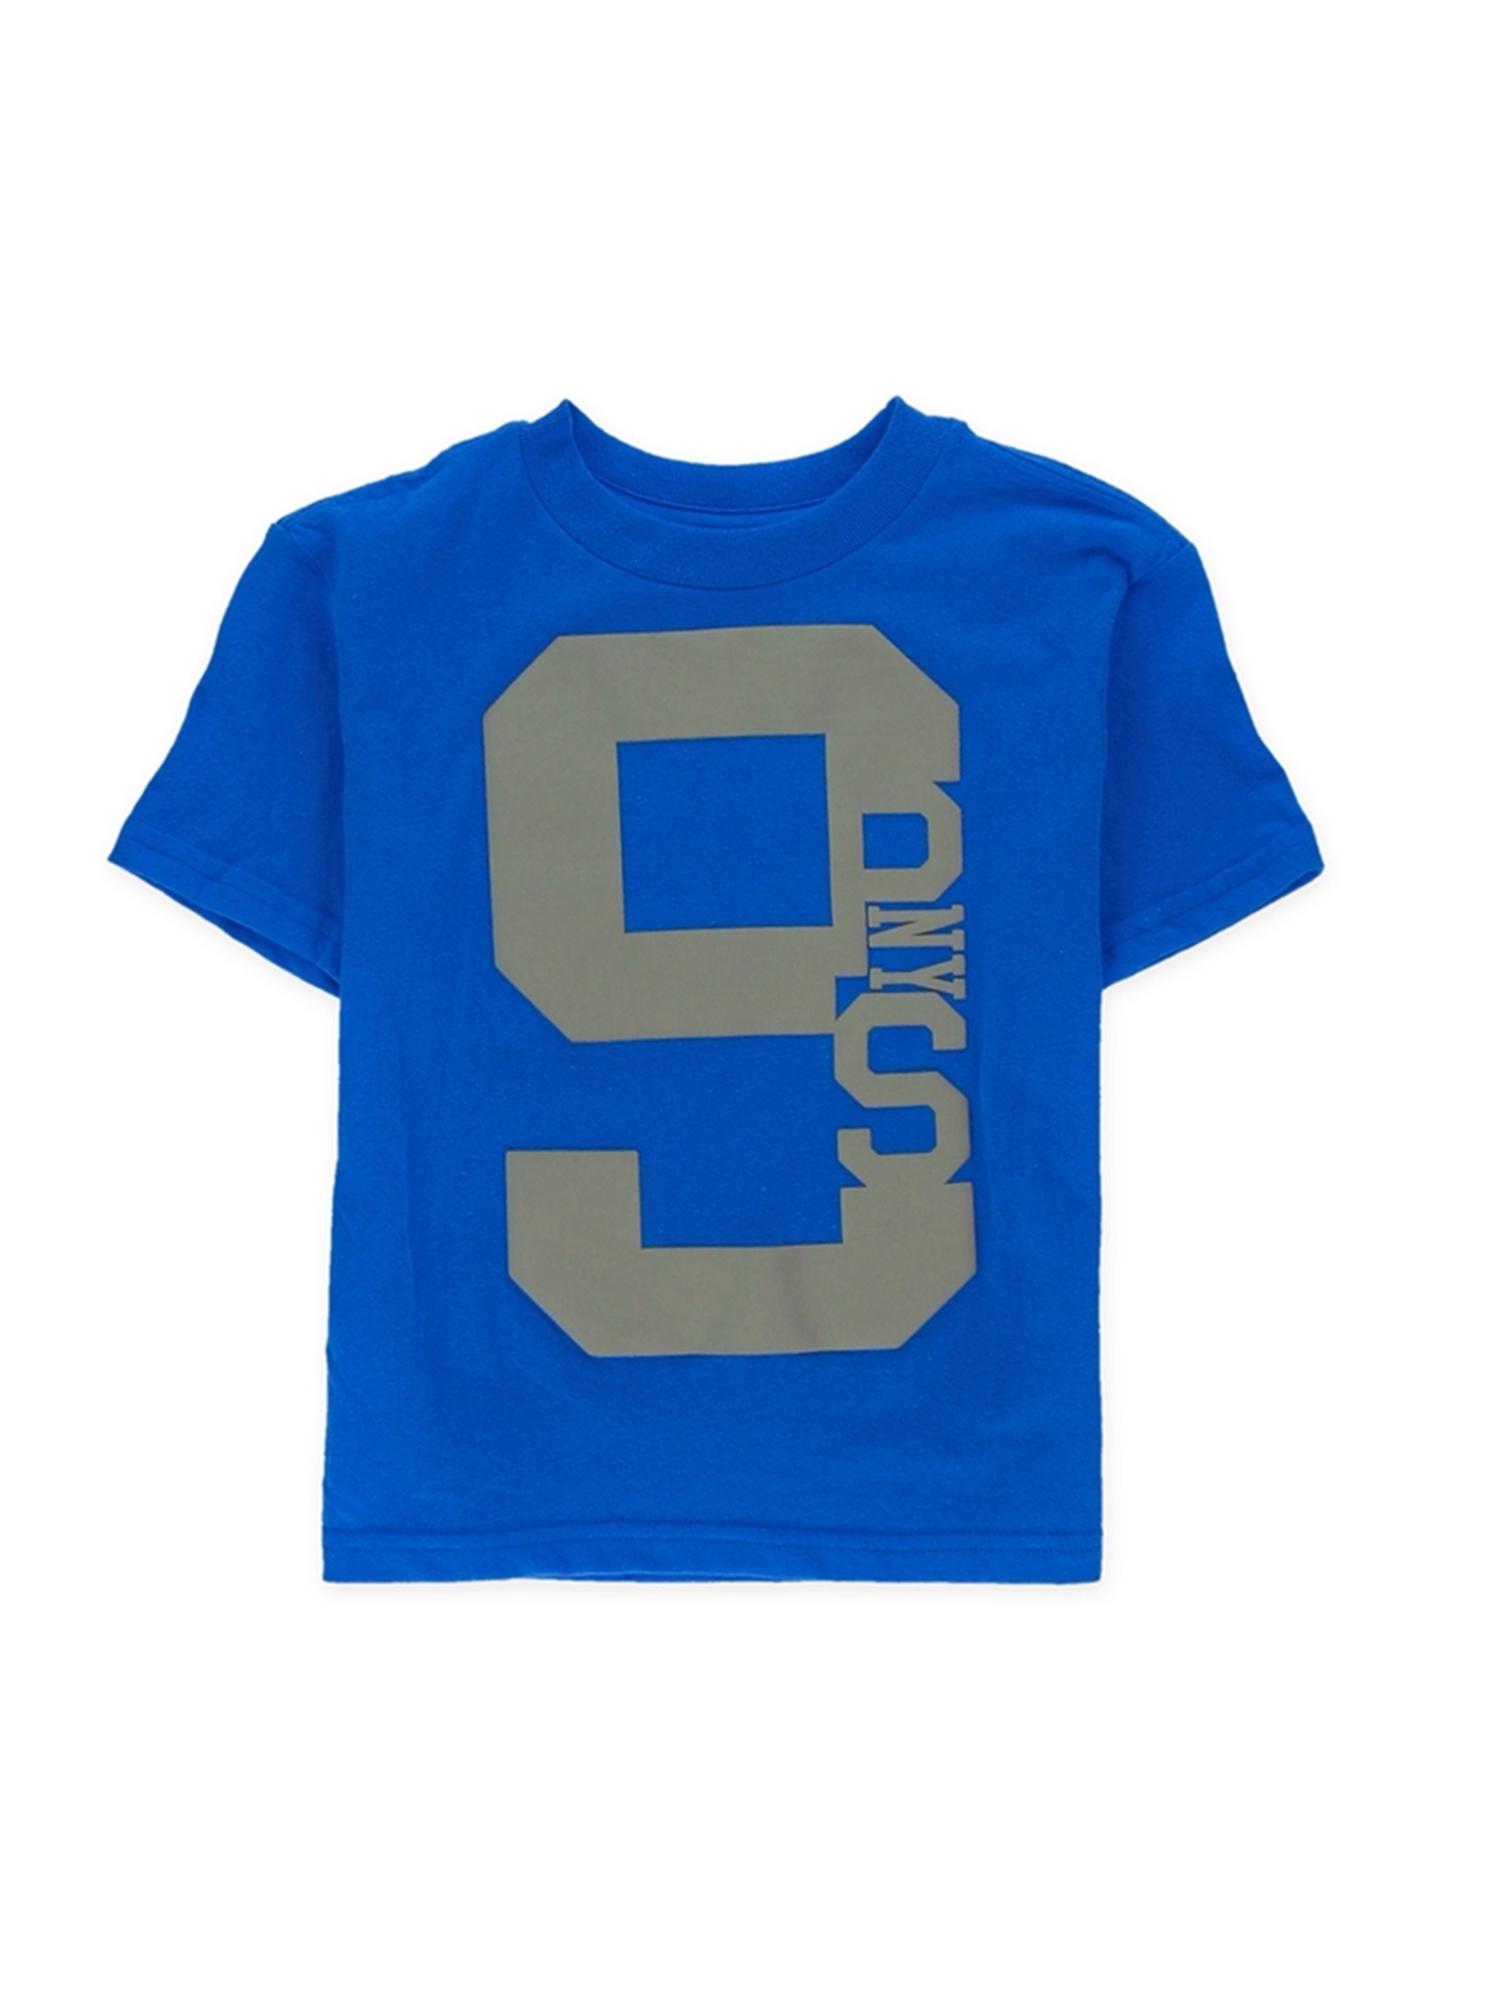 Aeropostale Boys Ps Ny Graphic T-Shirt 166 S - Big Kids (8-20)